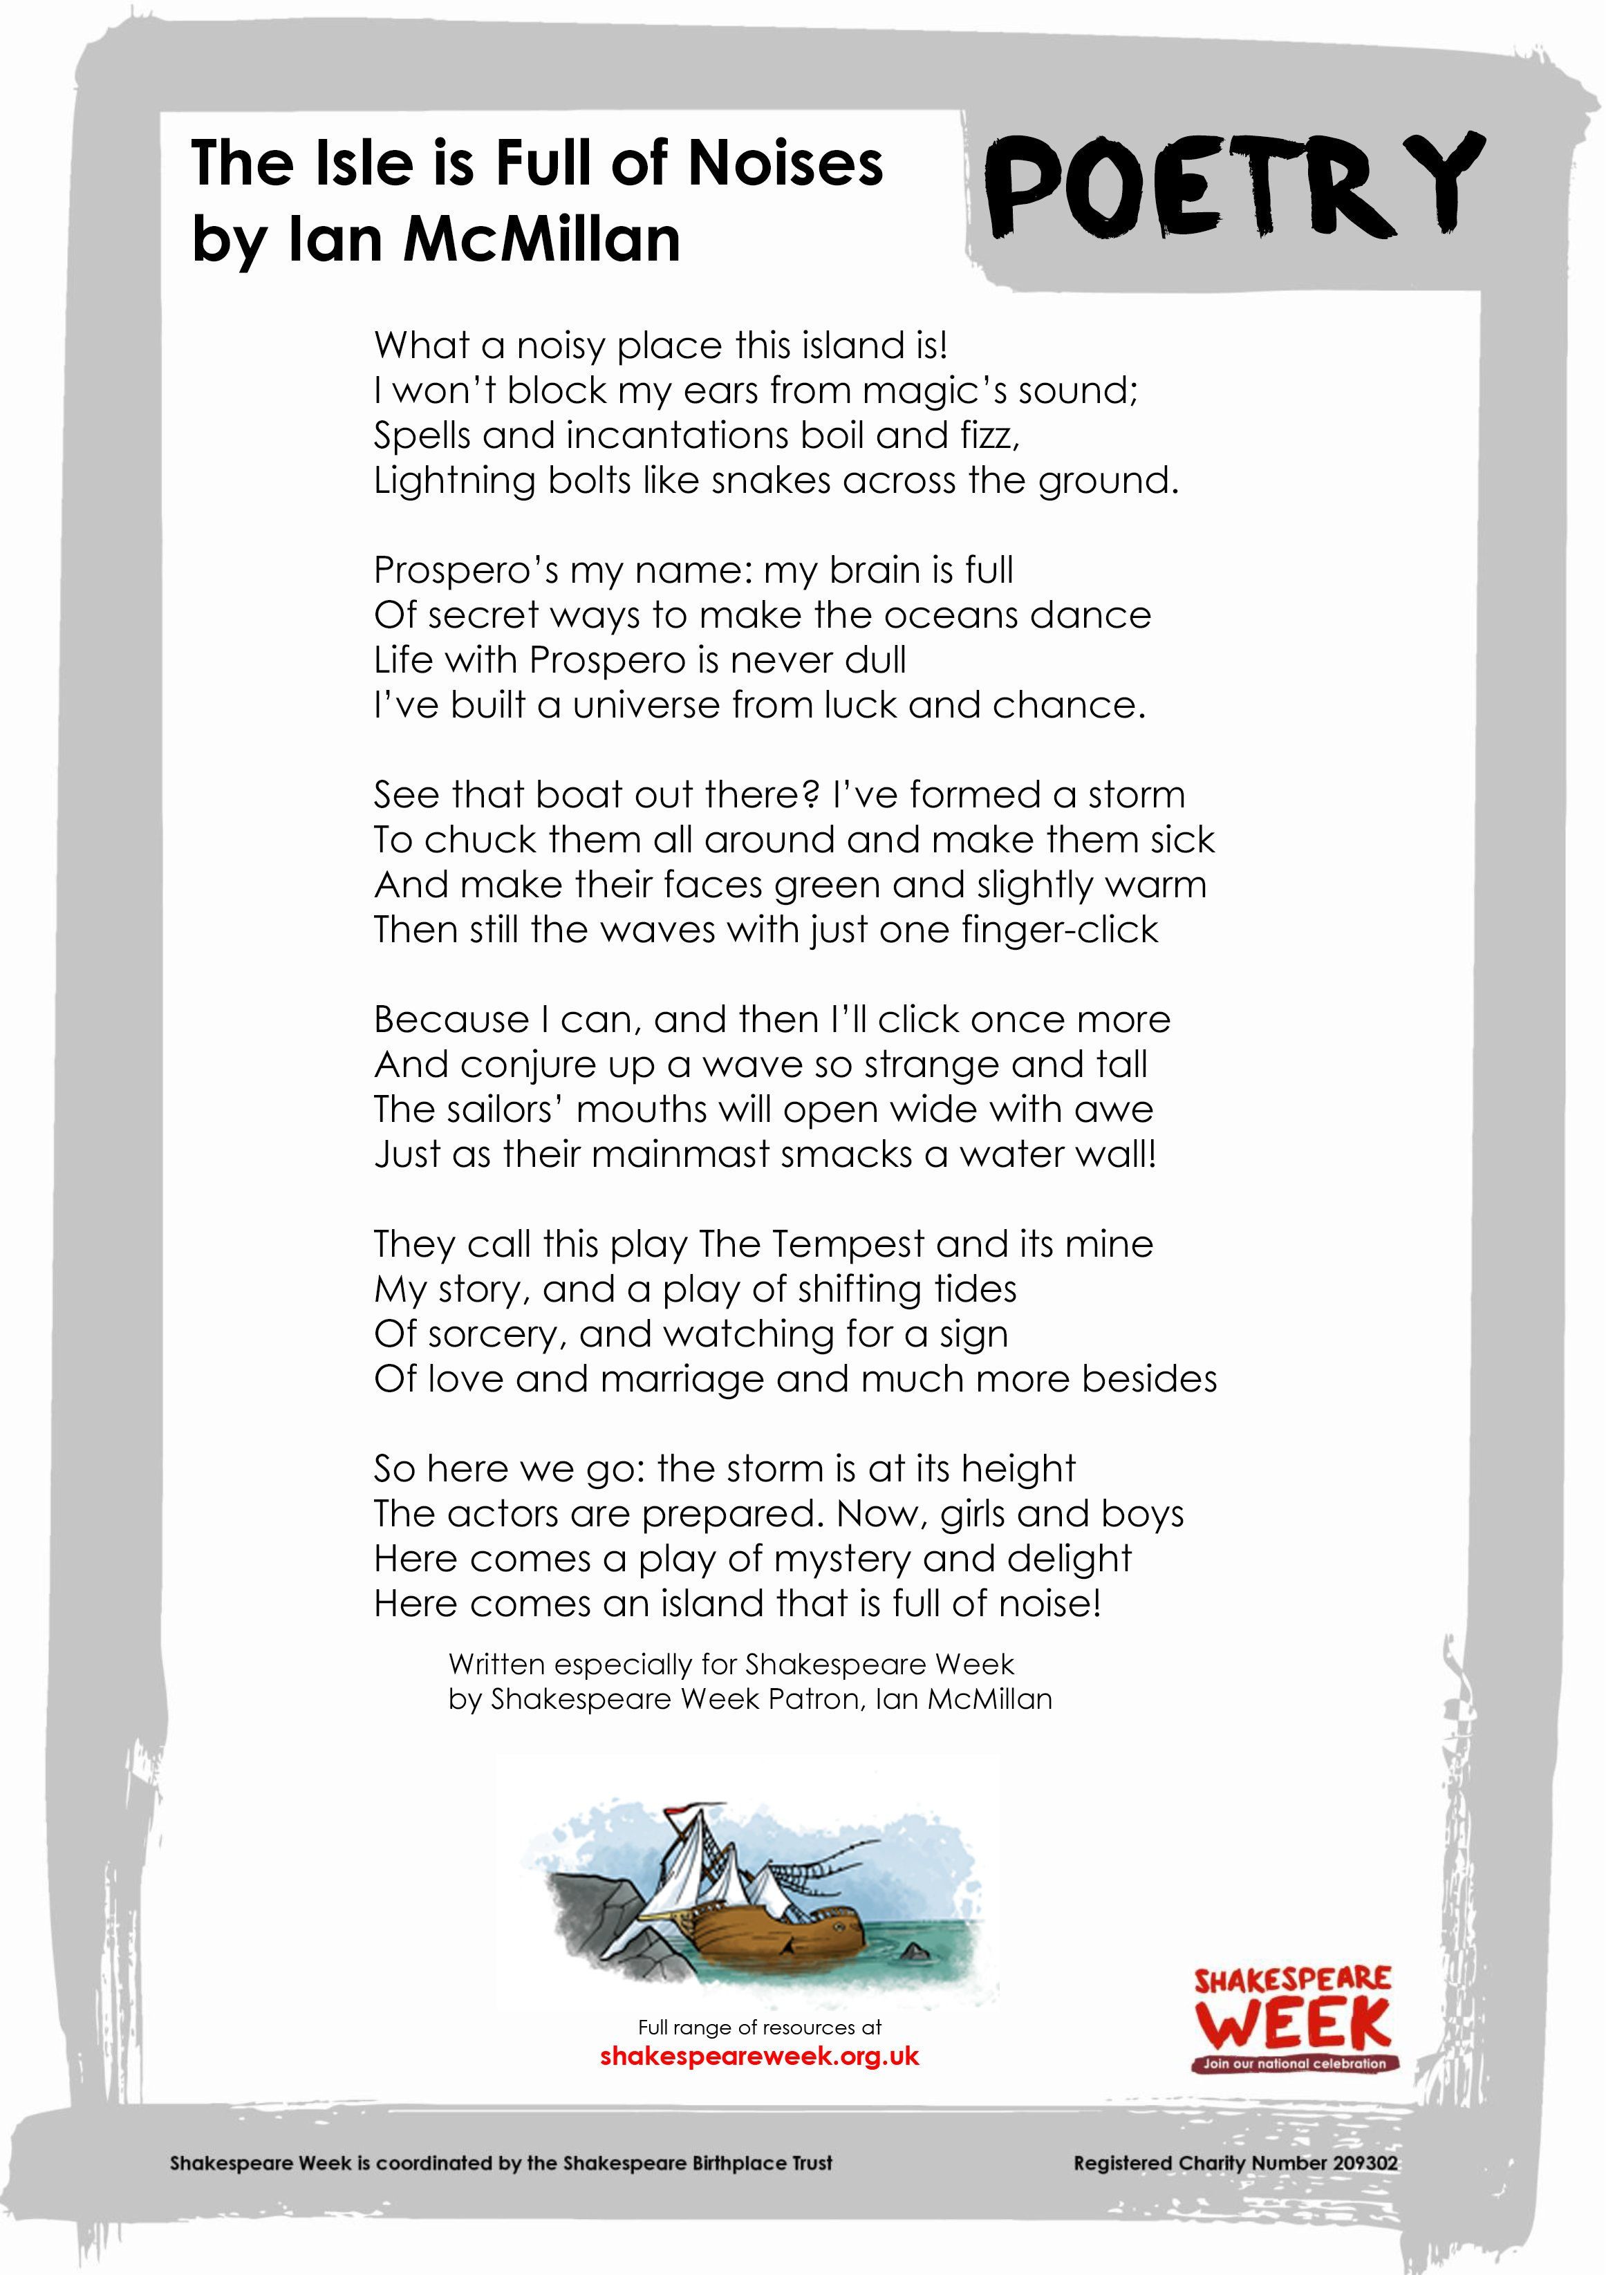 Ian McMillan poems